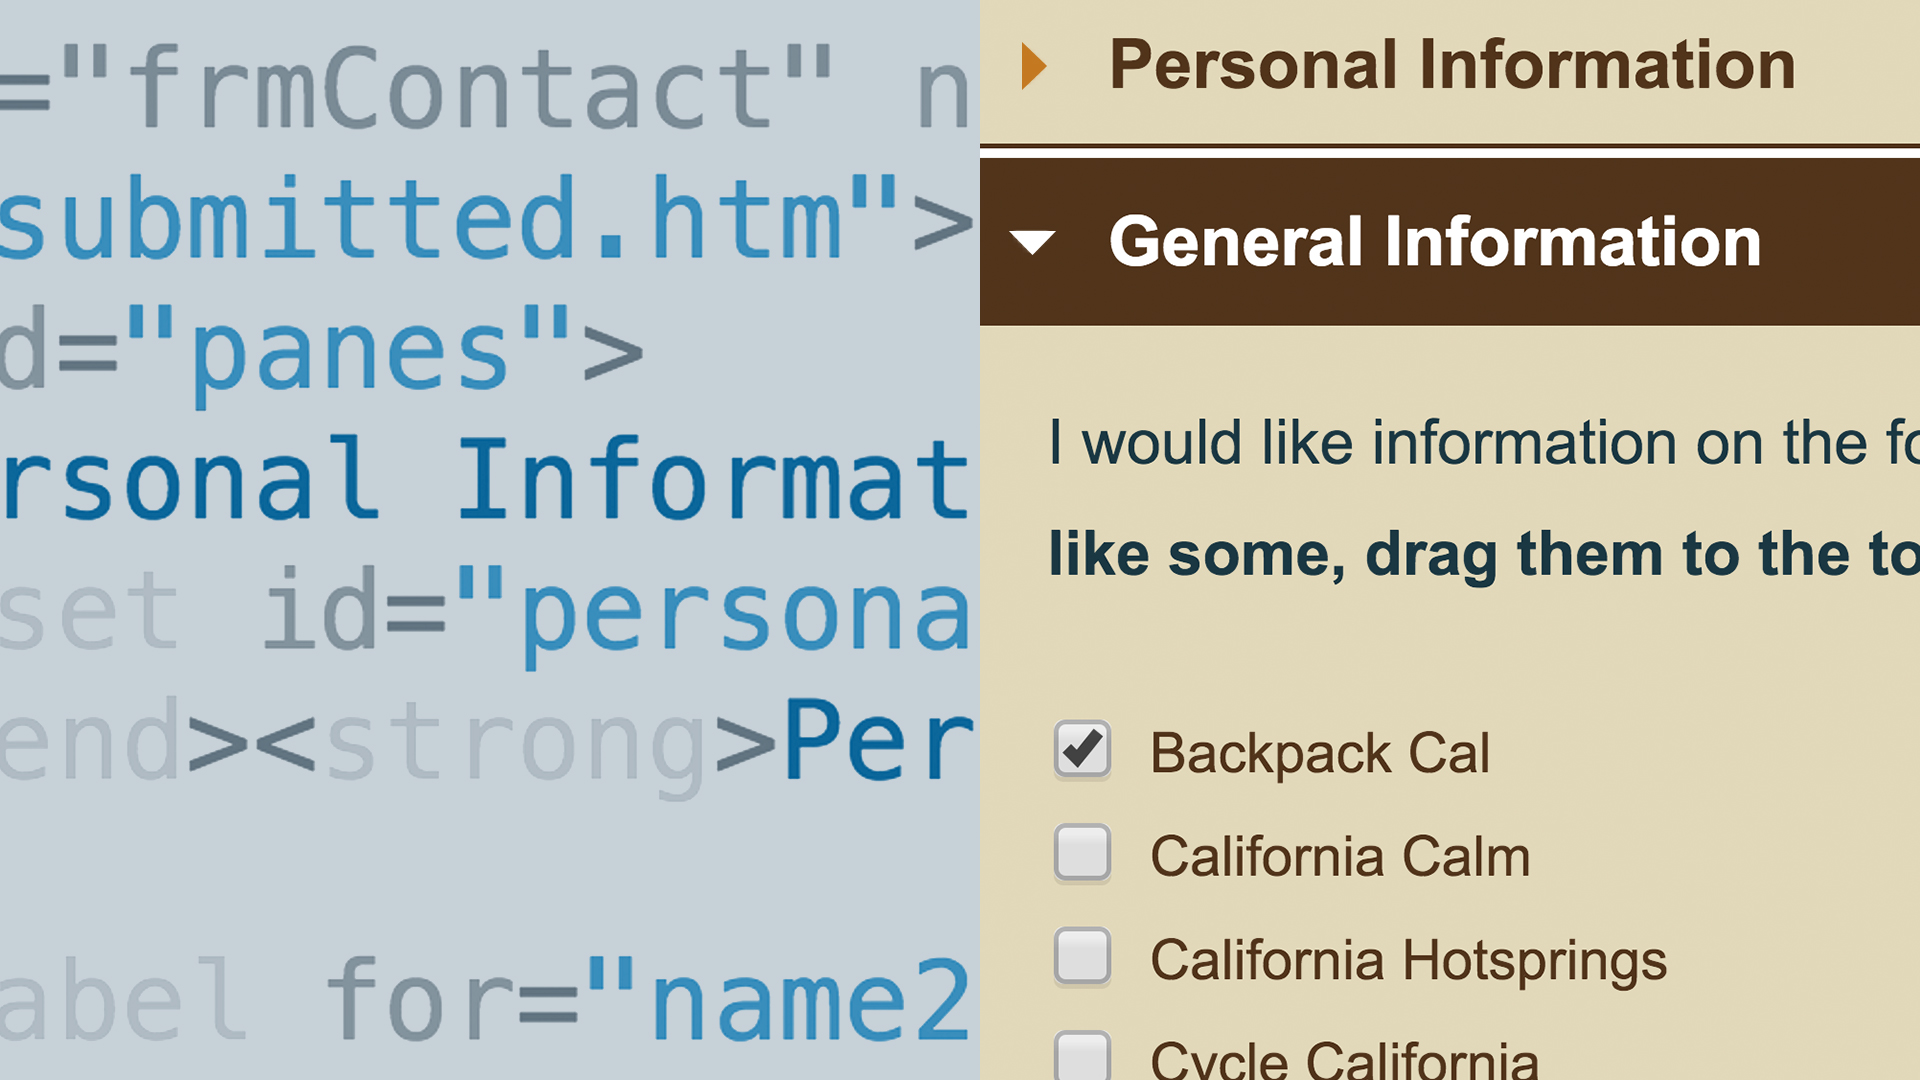 Jquery ui tutorial: adding a user interface with jquery ui | lynda.